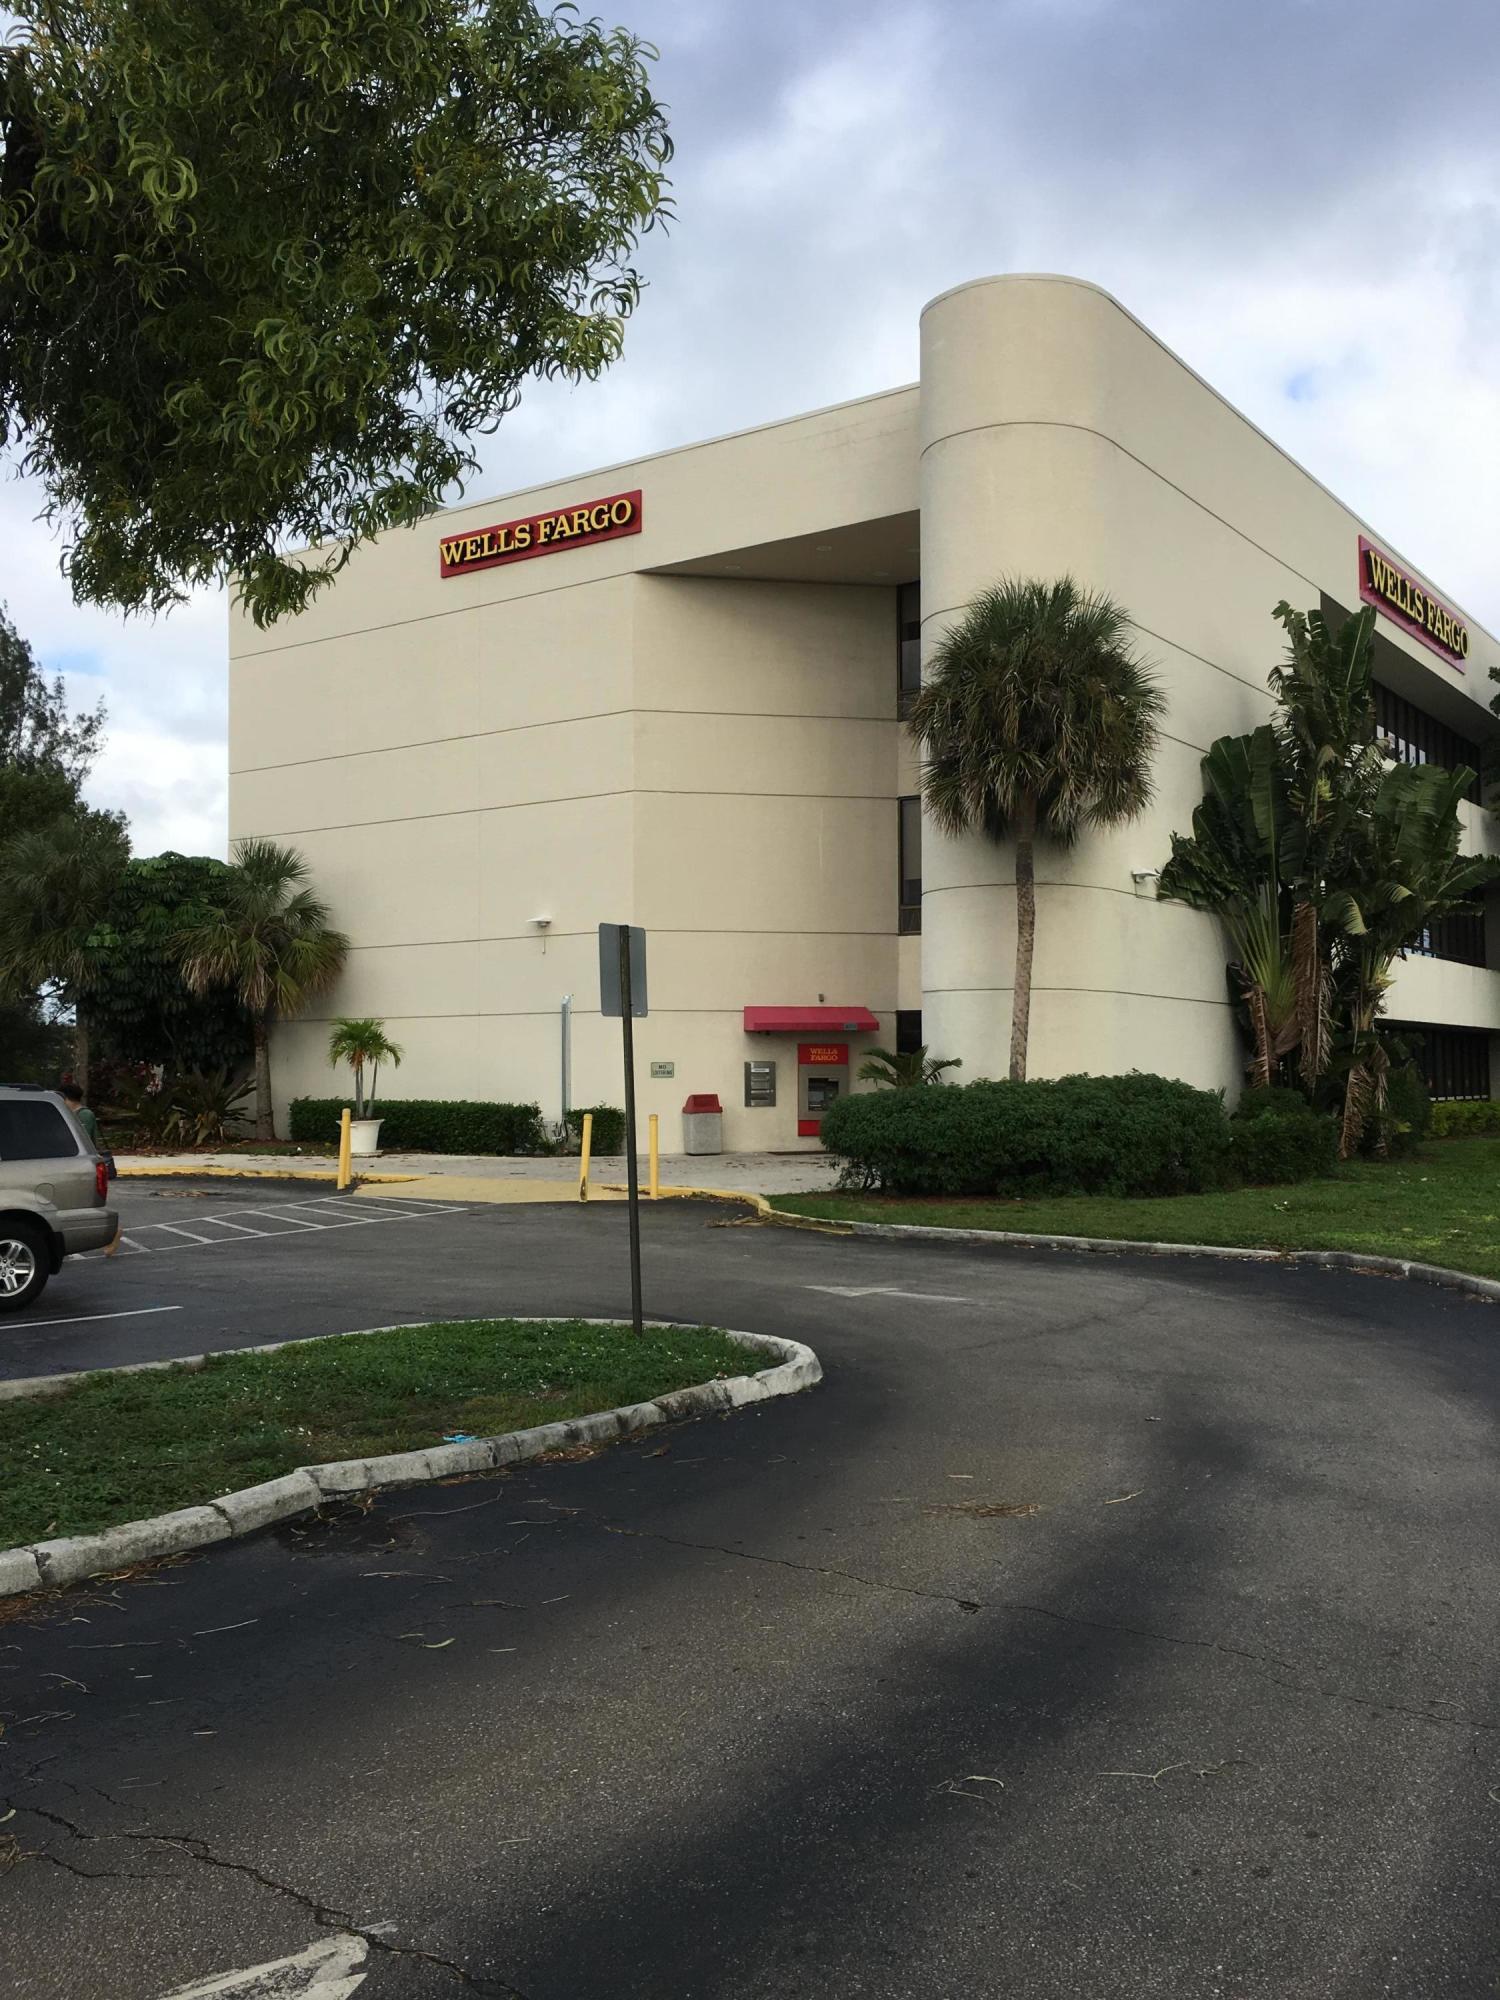 5849 Okeechobee Boulevard, West Palm Beach, Florida 33417, ,1 BathroomBathrooms,Commercial industrial,For Sale,Okeechobee,12,RX-10670163